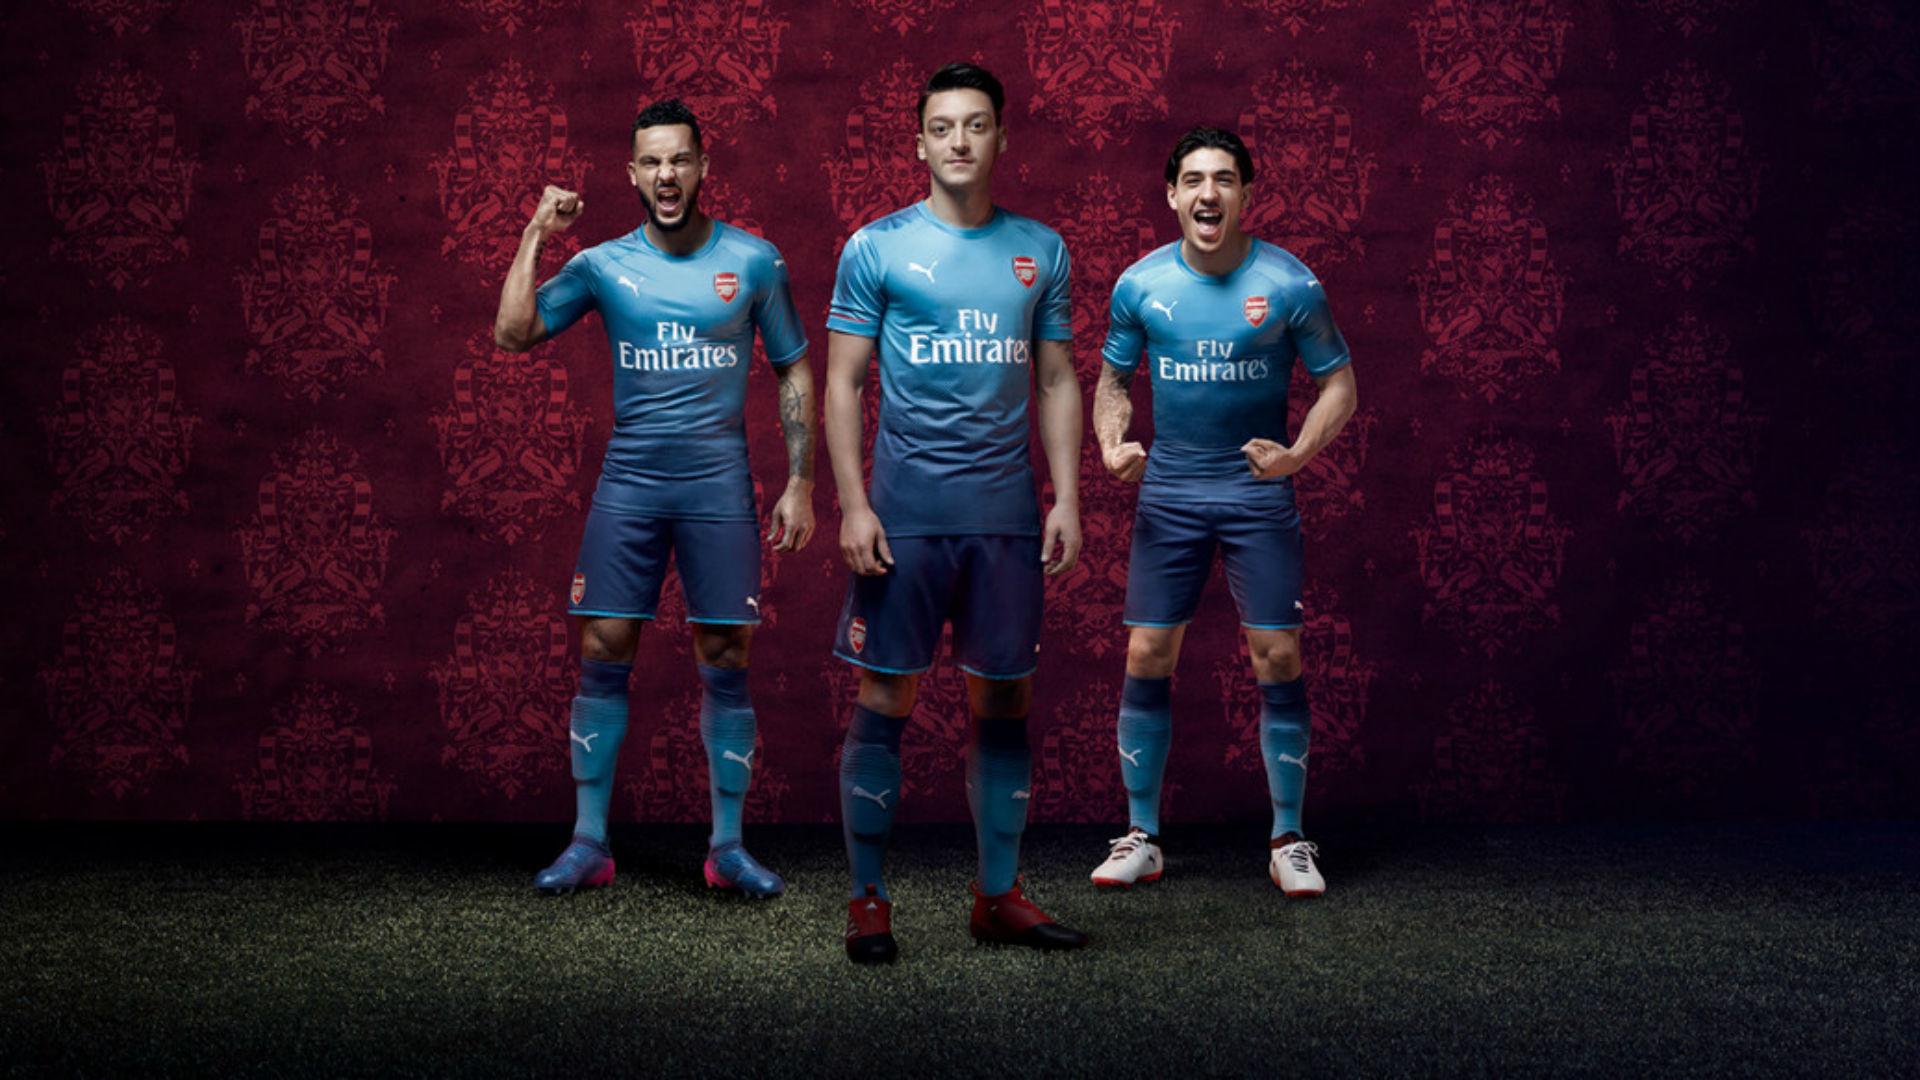 Adidas Logo Wallpaper Iphone Man Utd Wallpapers 2018 68 Images